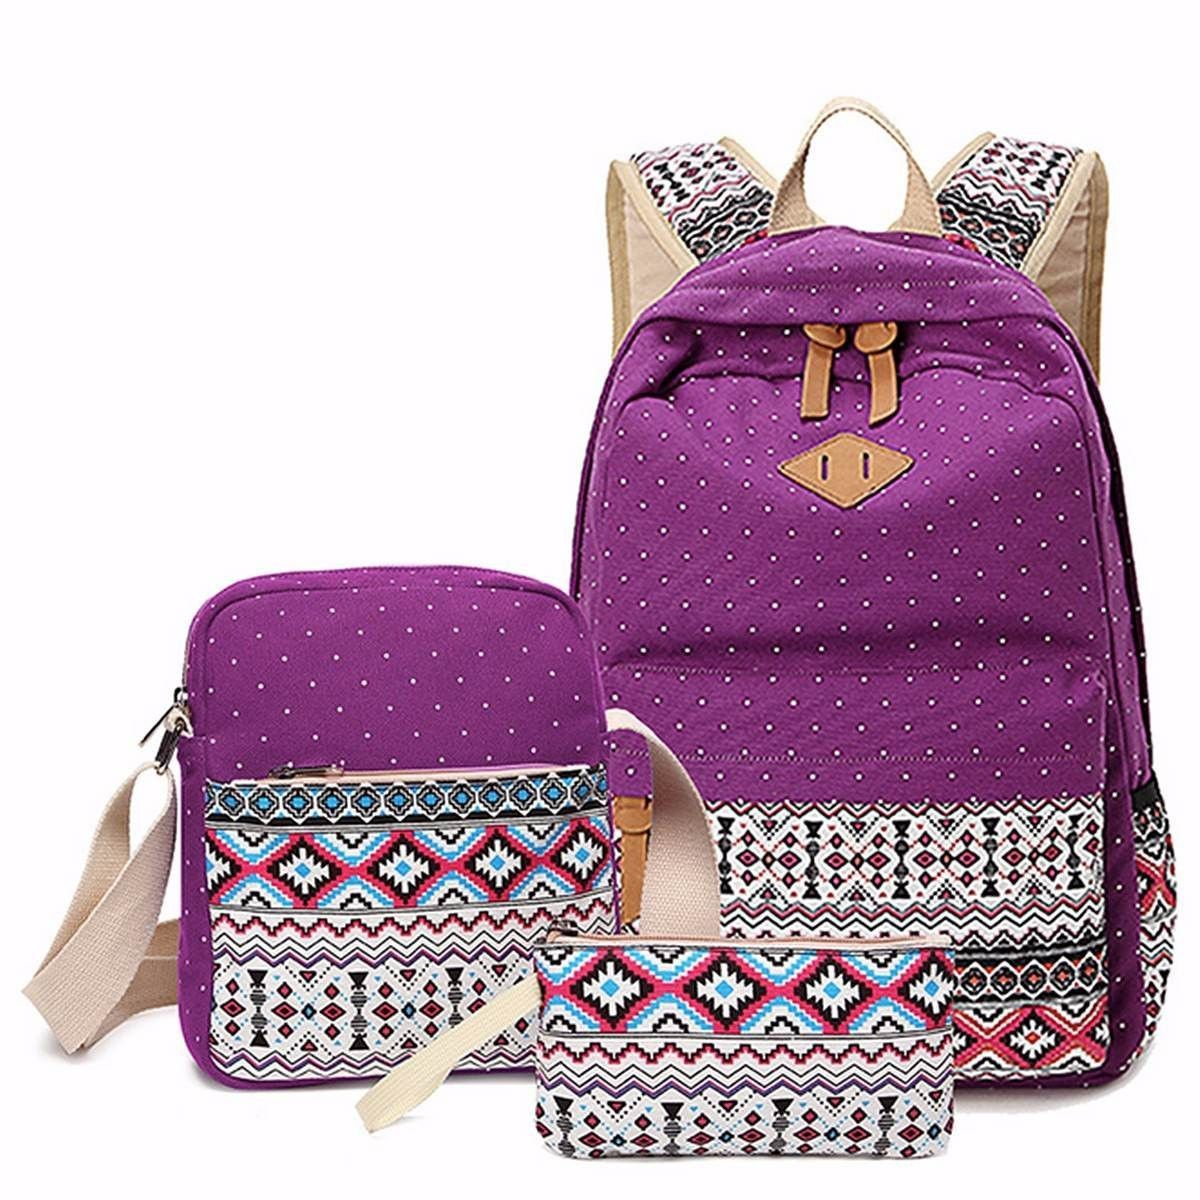 5bd61f7fb5 3 pcs set Women Backpack Canvas Printing School Bags Girls Backpacks Cute  Rucksack Schoolbag Lady Bookbags